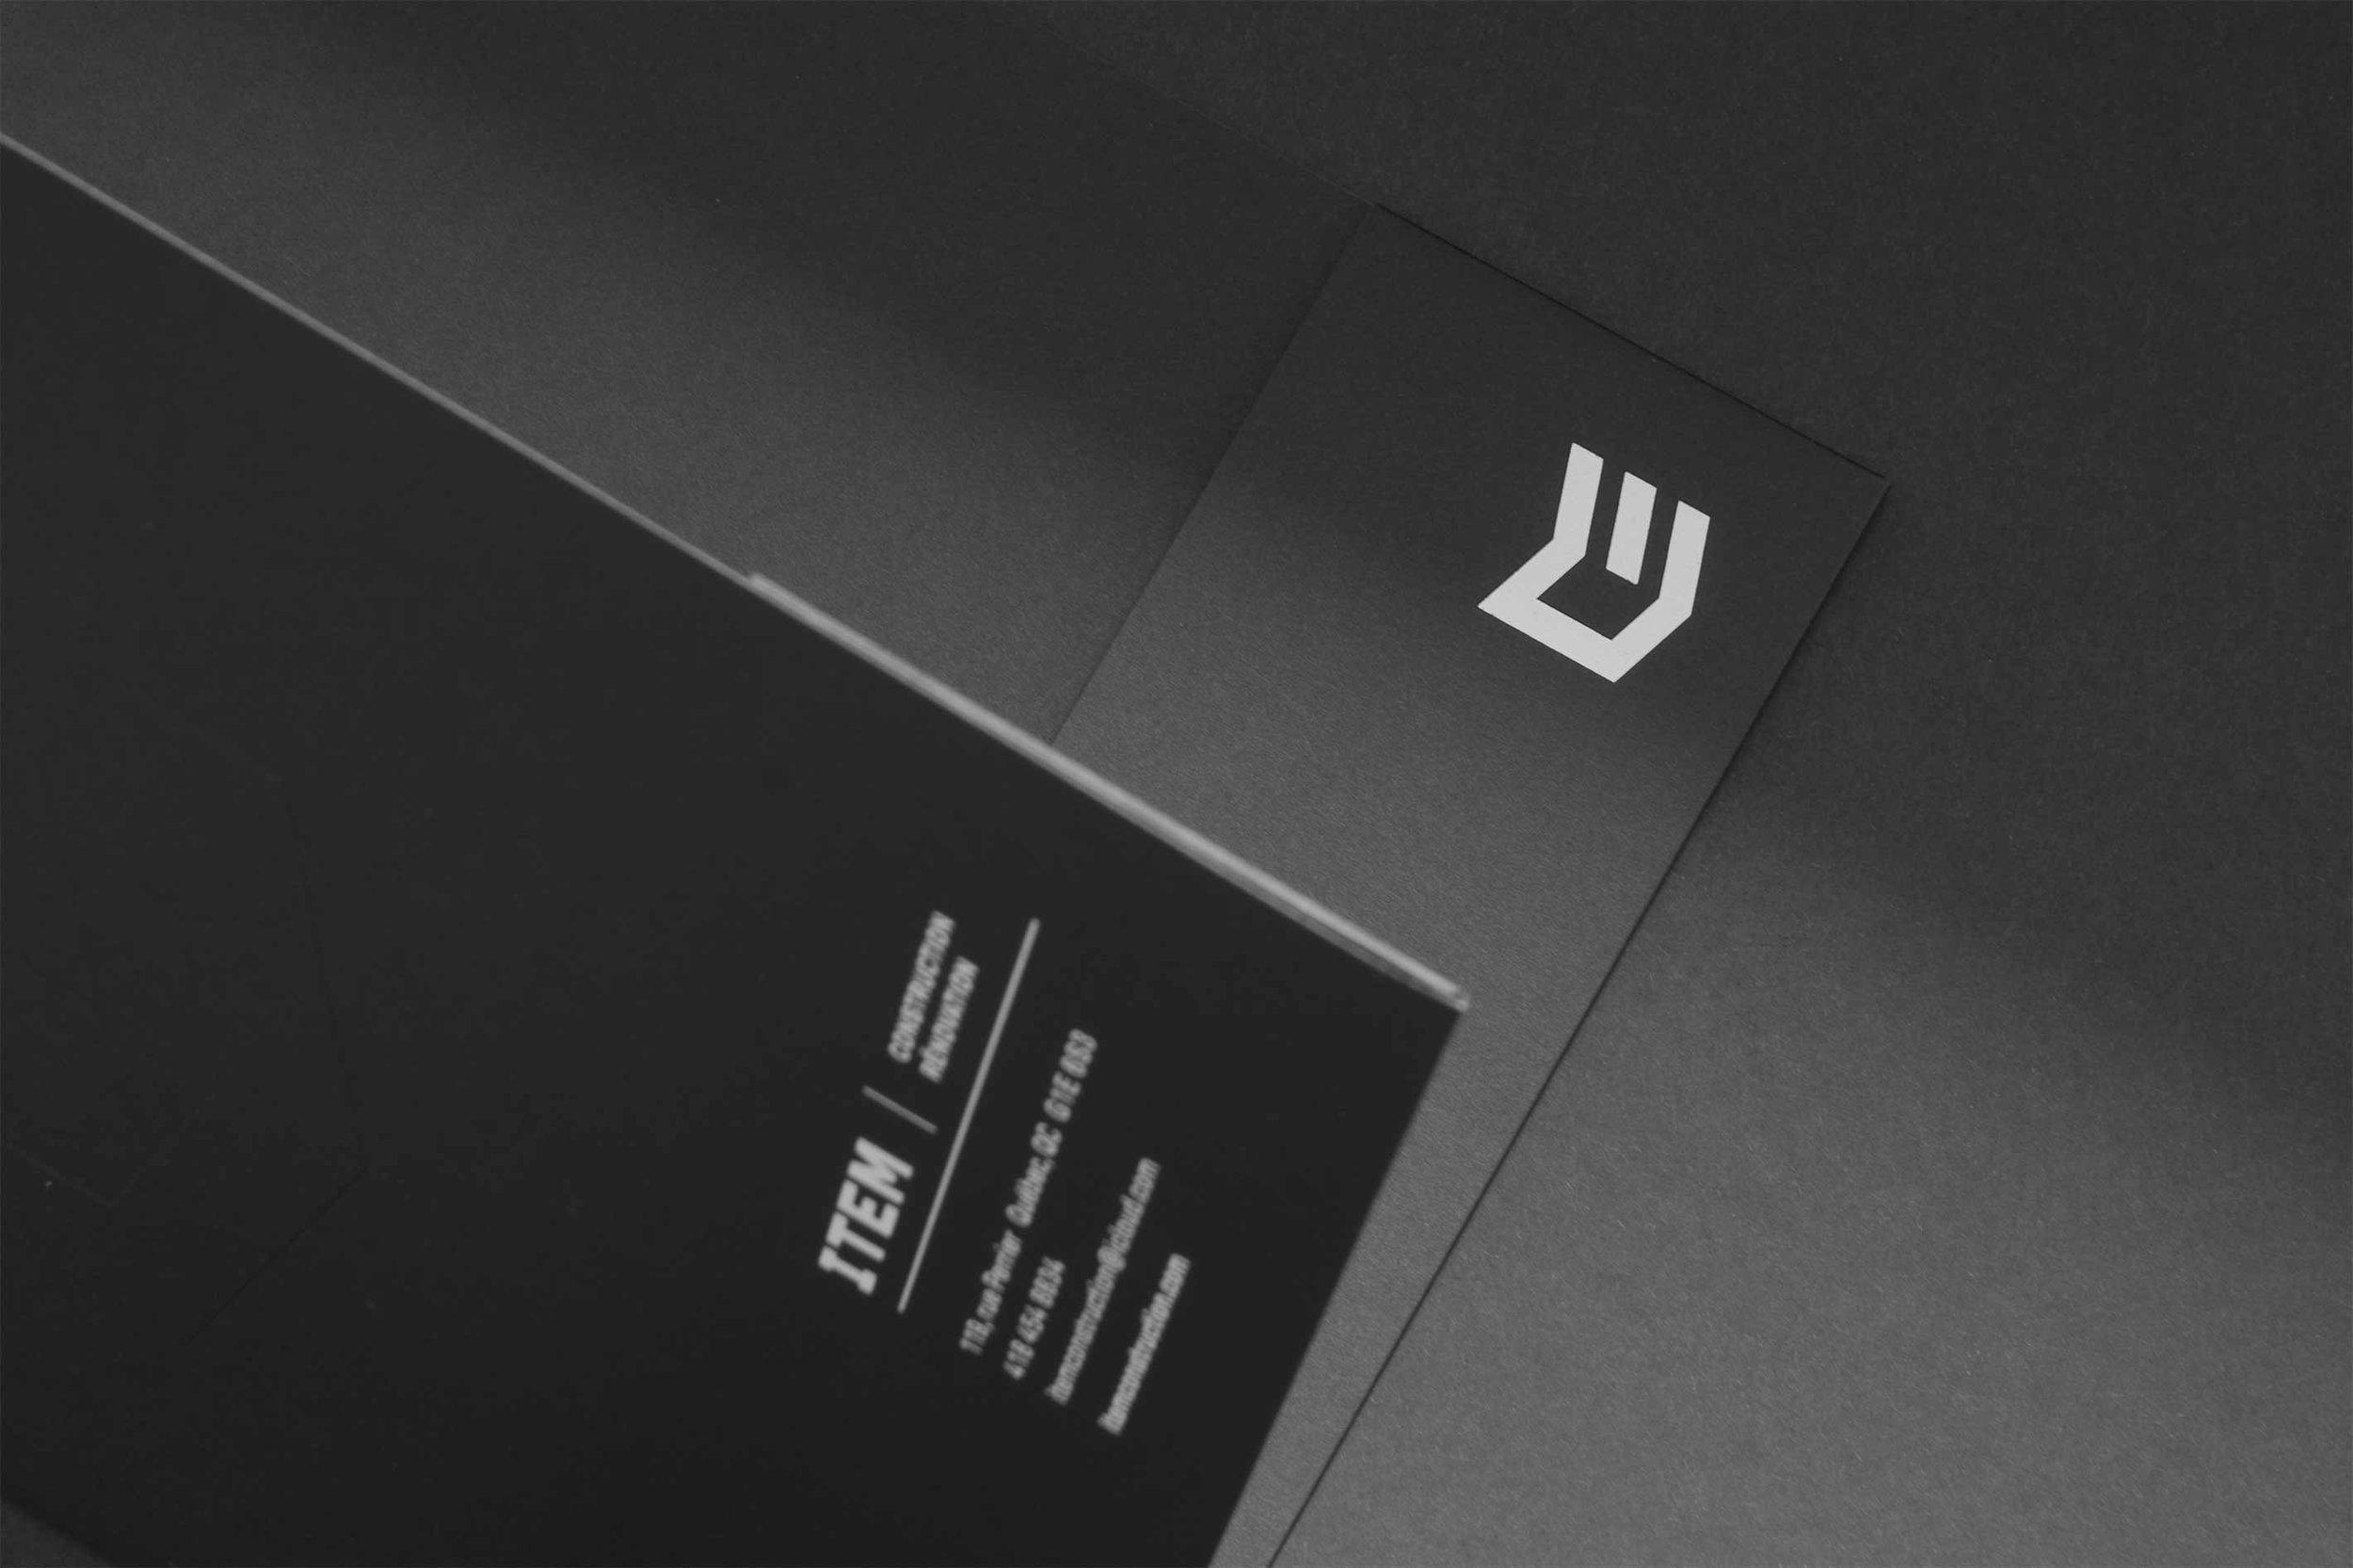 Figure-Jeremy-Hall-Design-Graphique-Quebec-Logo-Branding-Image-De-Marque-Item-Construction-15.jpg